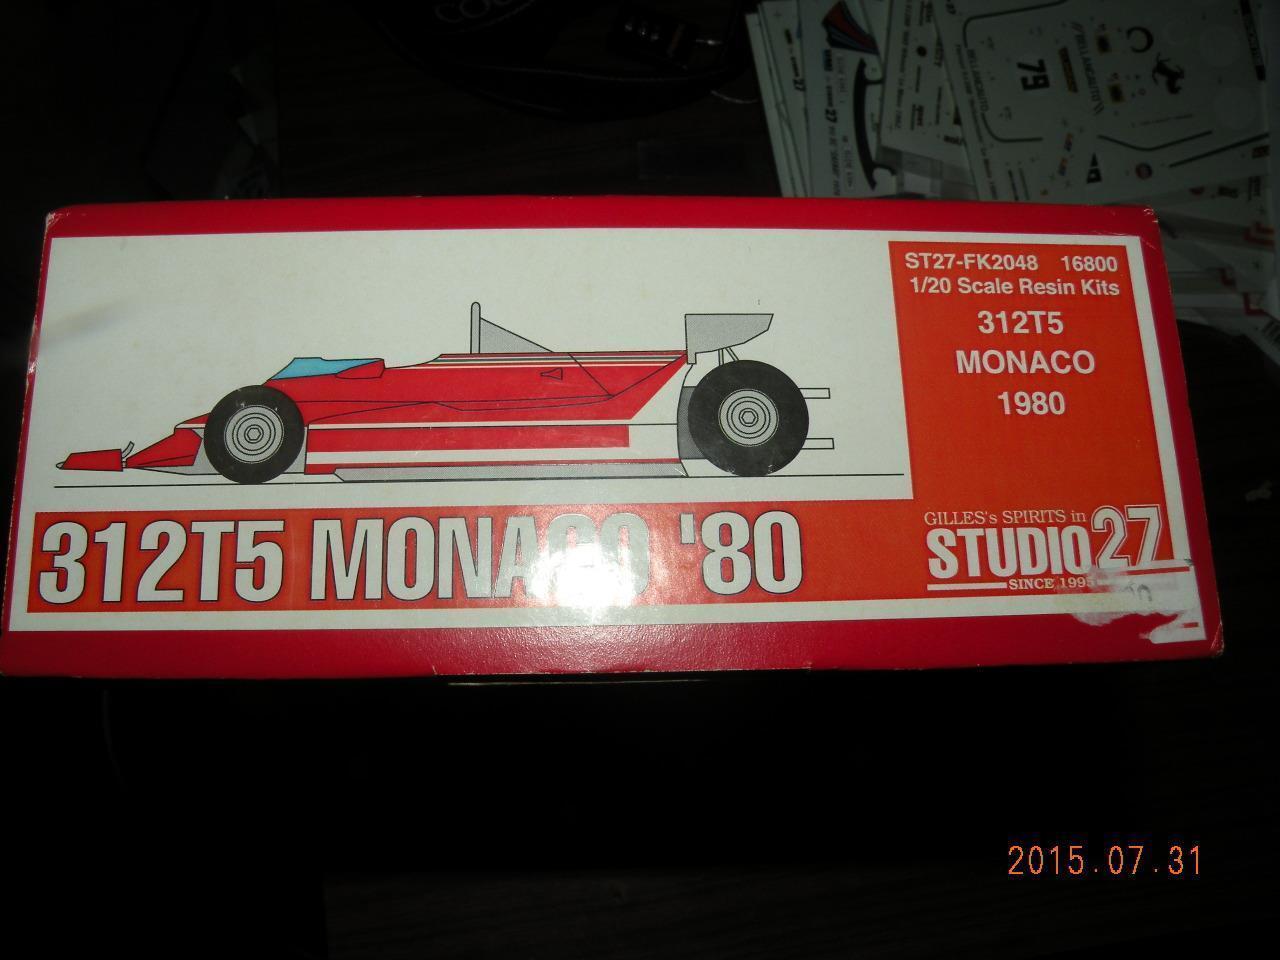 Garantía 100% de ajuste Studio 27 27 27  F1 Ferrari 312T5 Kit De Resina  compras online de deportes